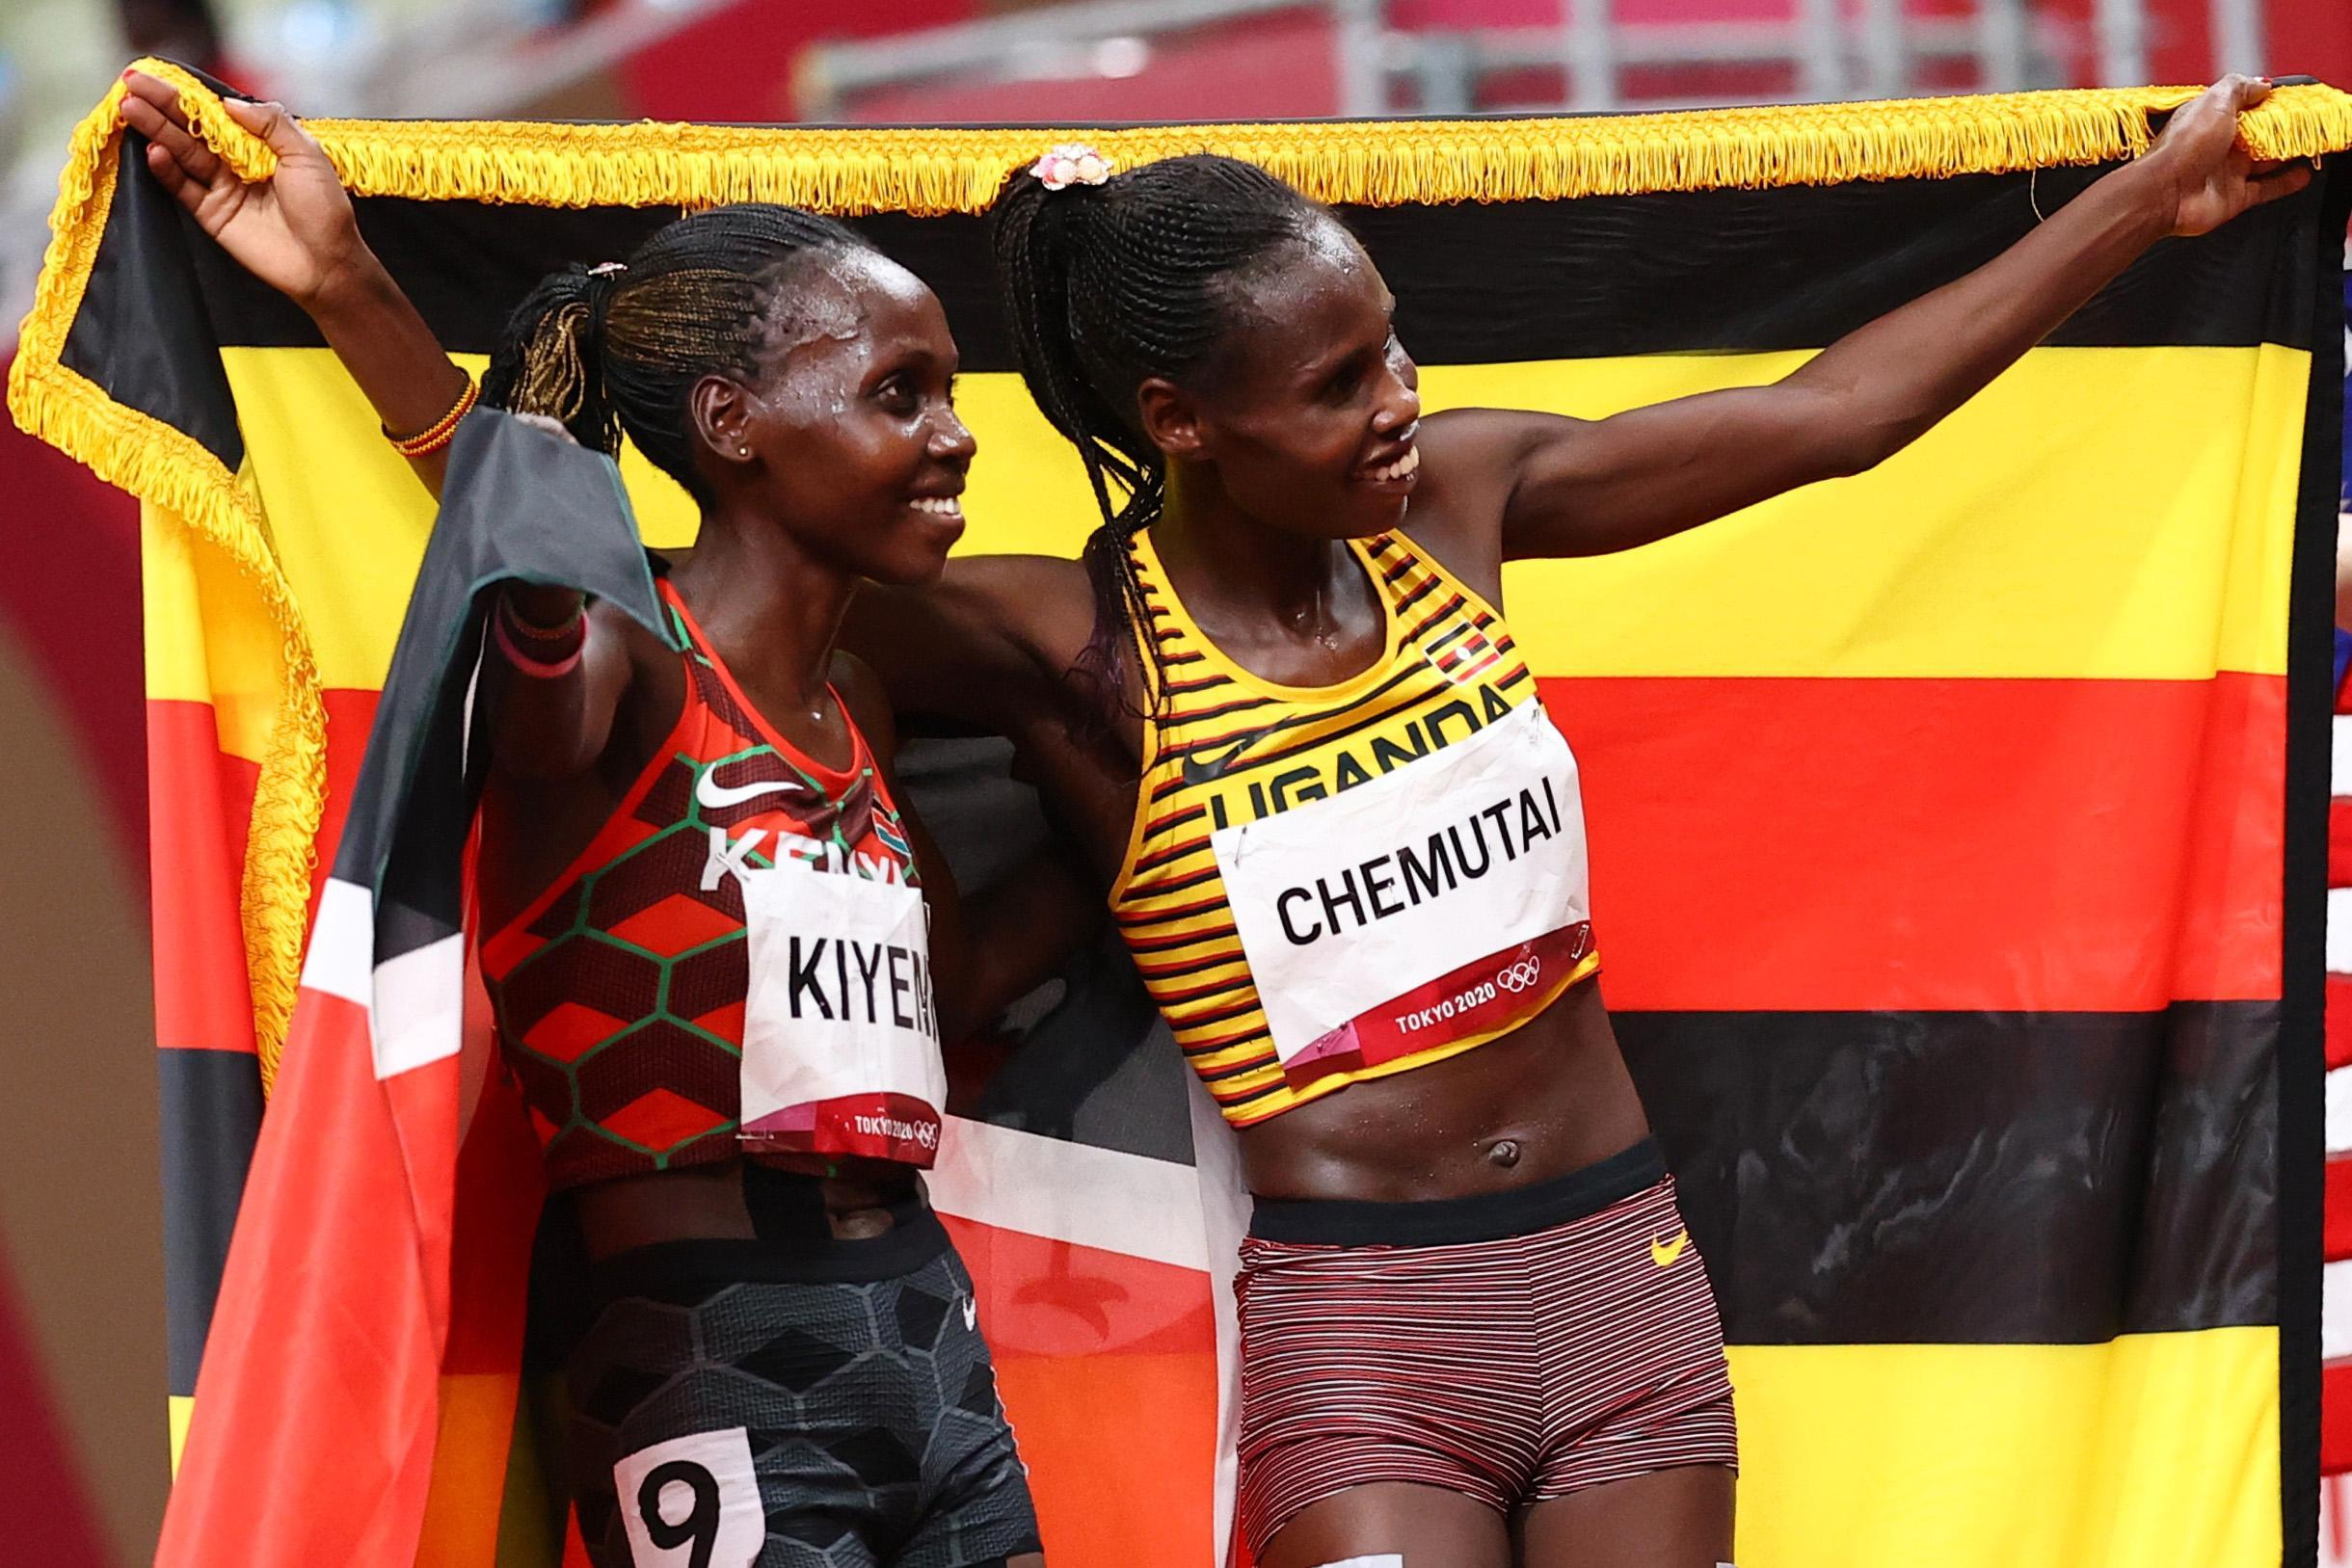 Uganda madalya alan sporculara maaş, ev ve araba verdi